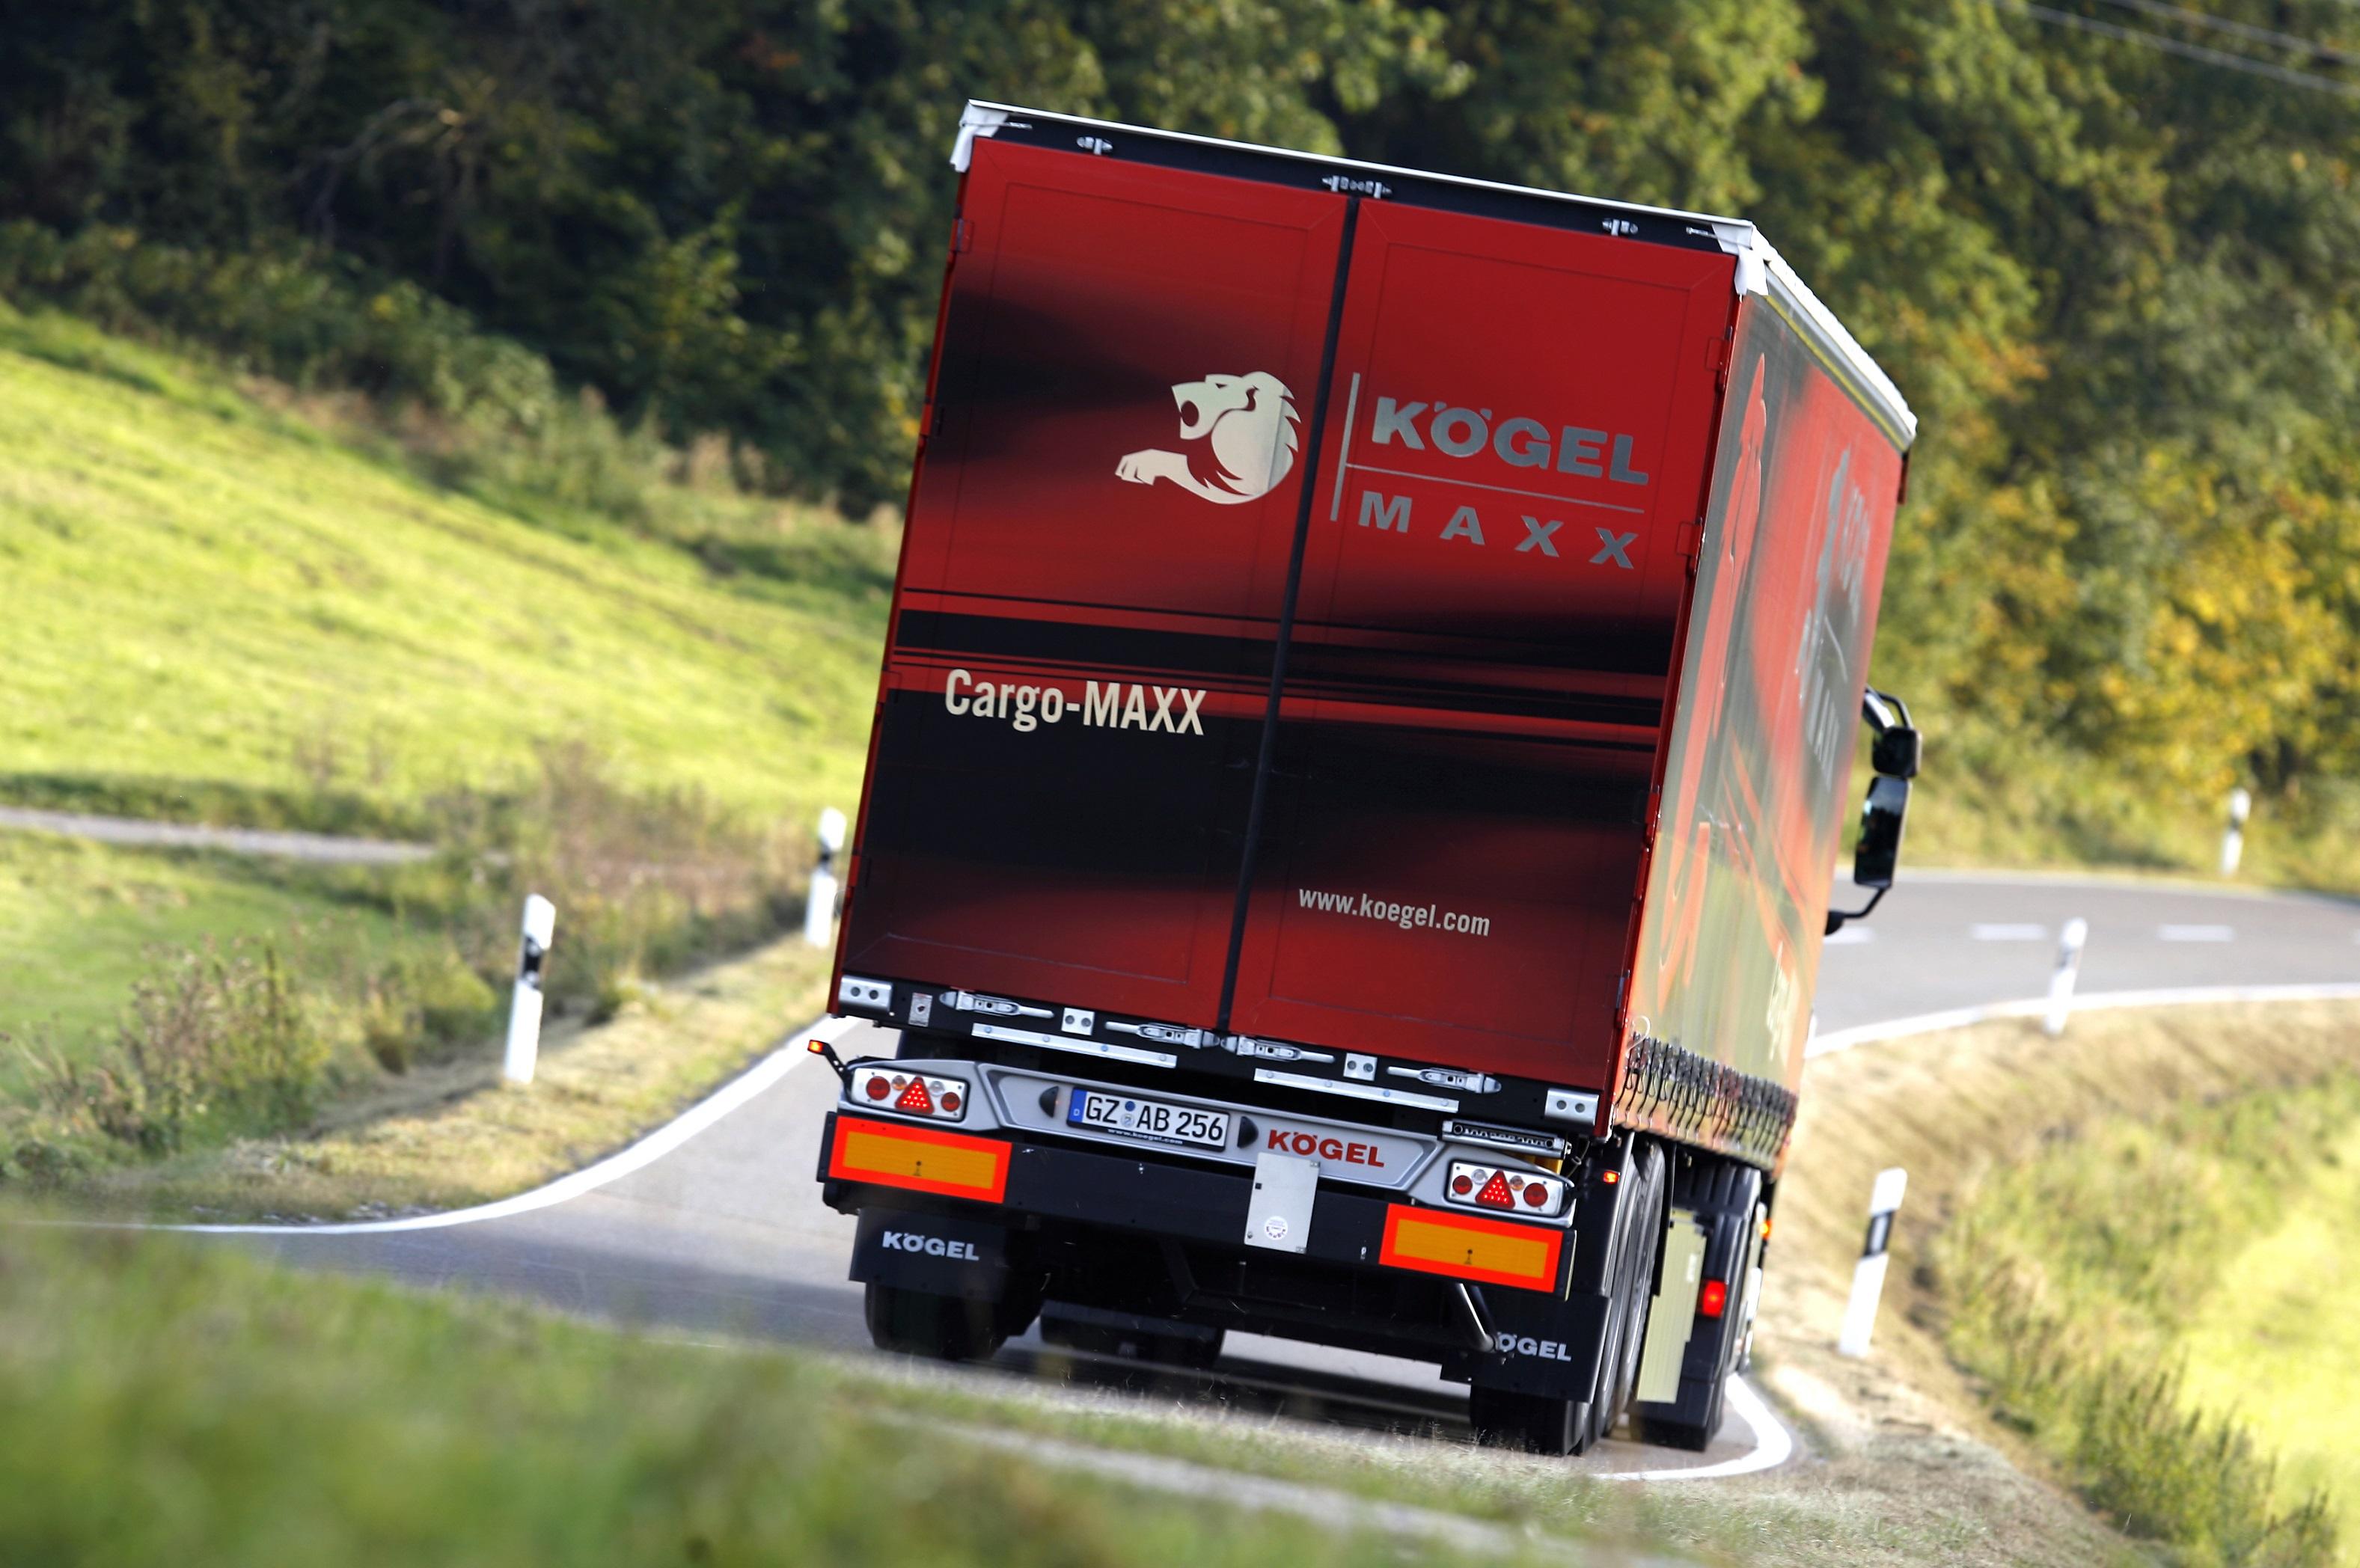 Kögel, Mega Maxx, Cargo Maxx